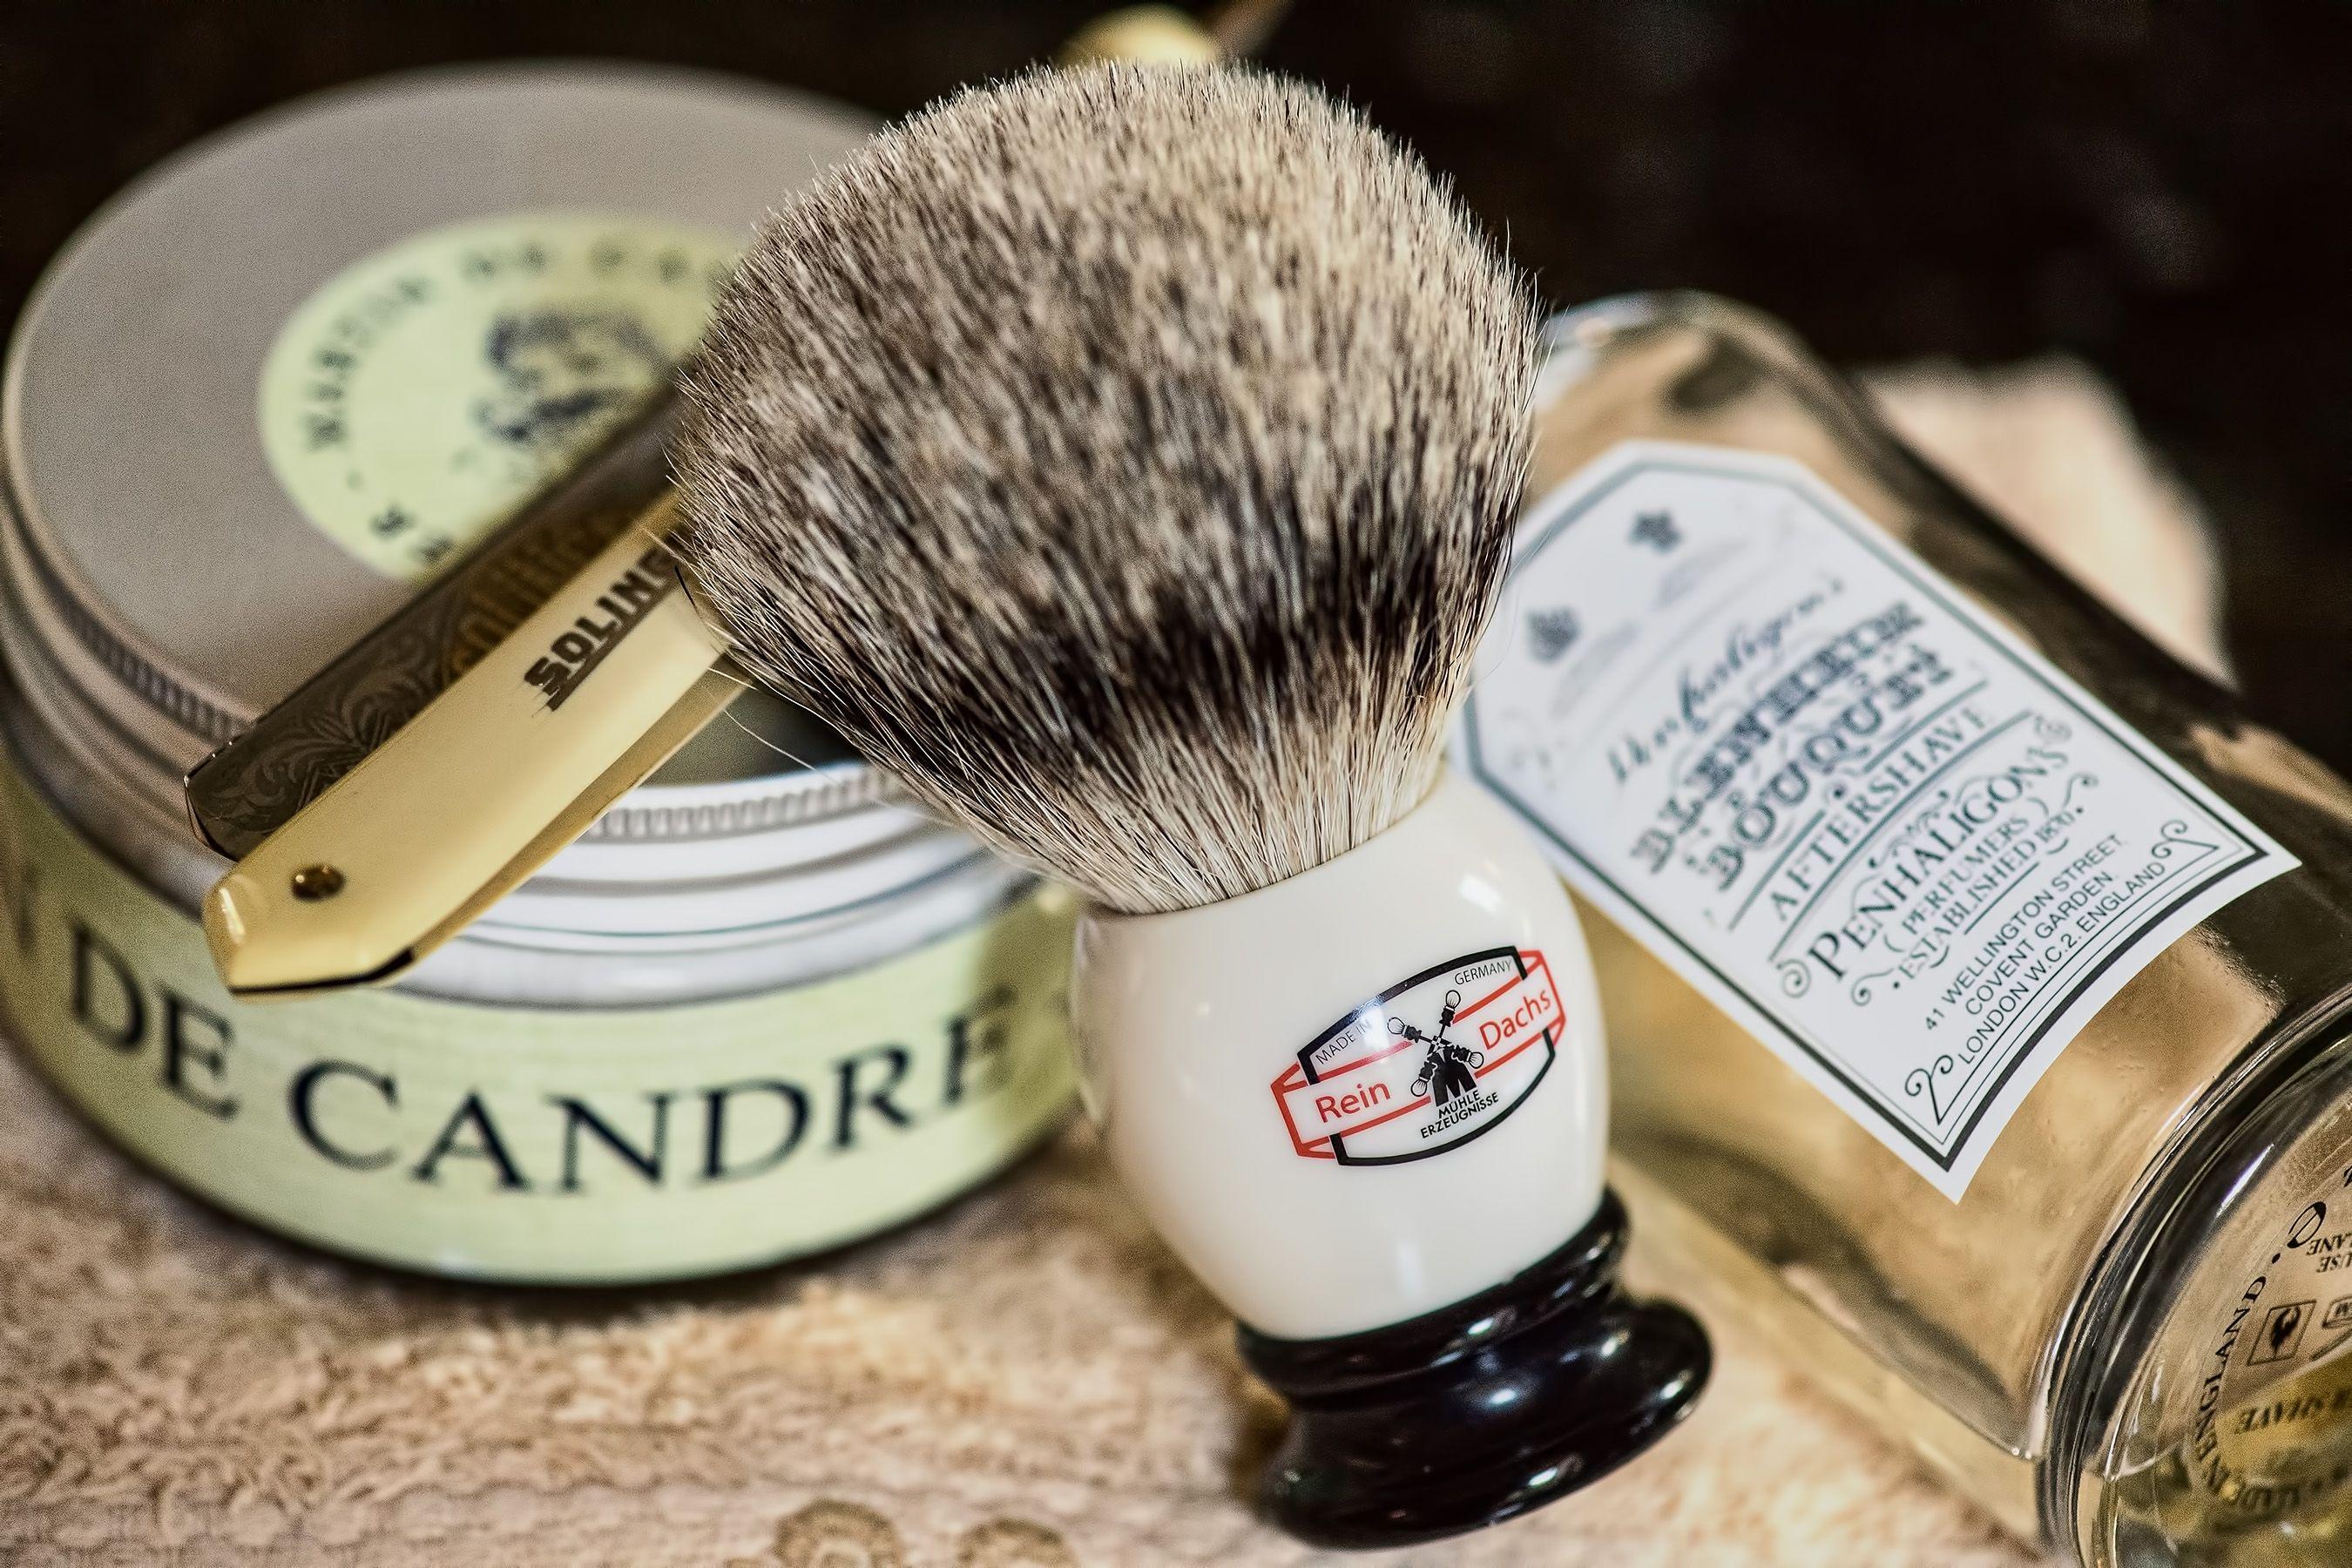 "Martin de Candre fougere shave soap, Muehle badger brush, Friedellko 5/8"" ""Saturday"" straight razor, Penhaligon's Blenheim Bouquet aftershave, December 31, 2016.  ©Sarimento1"